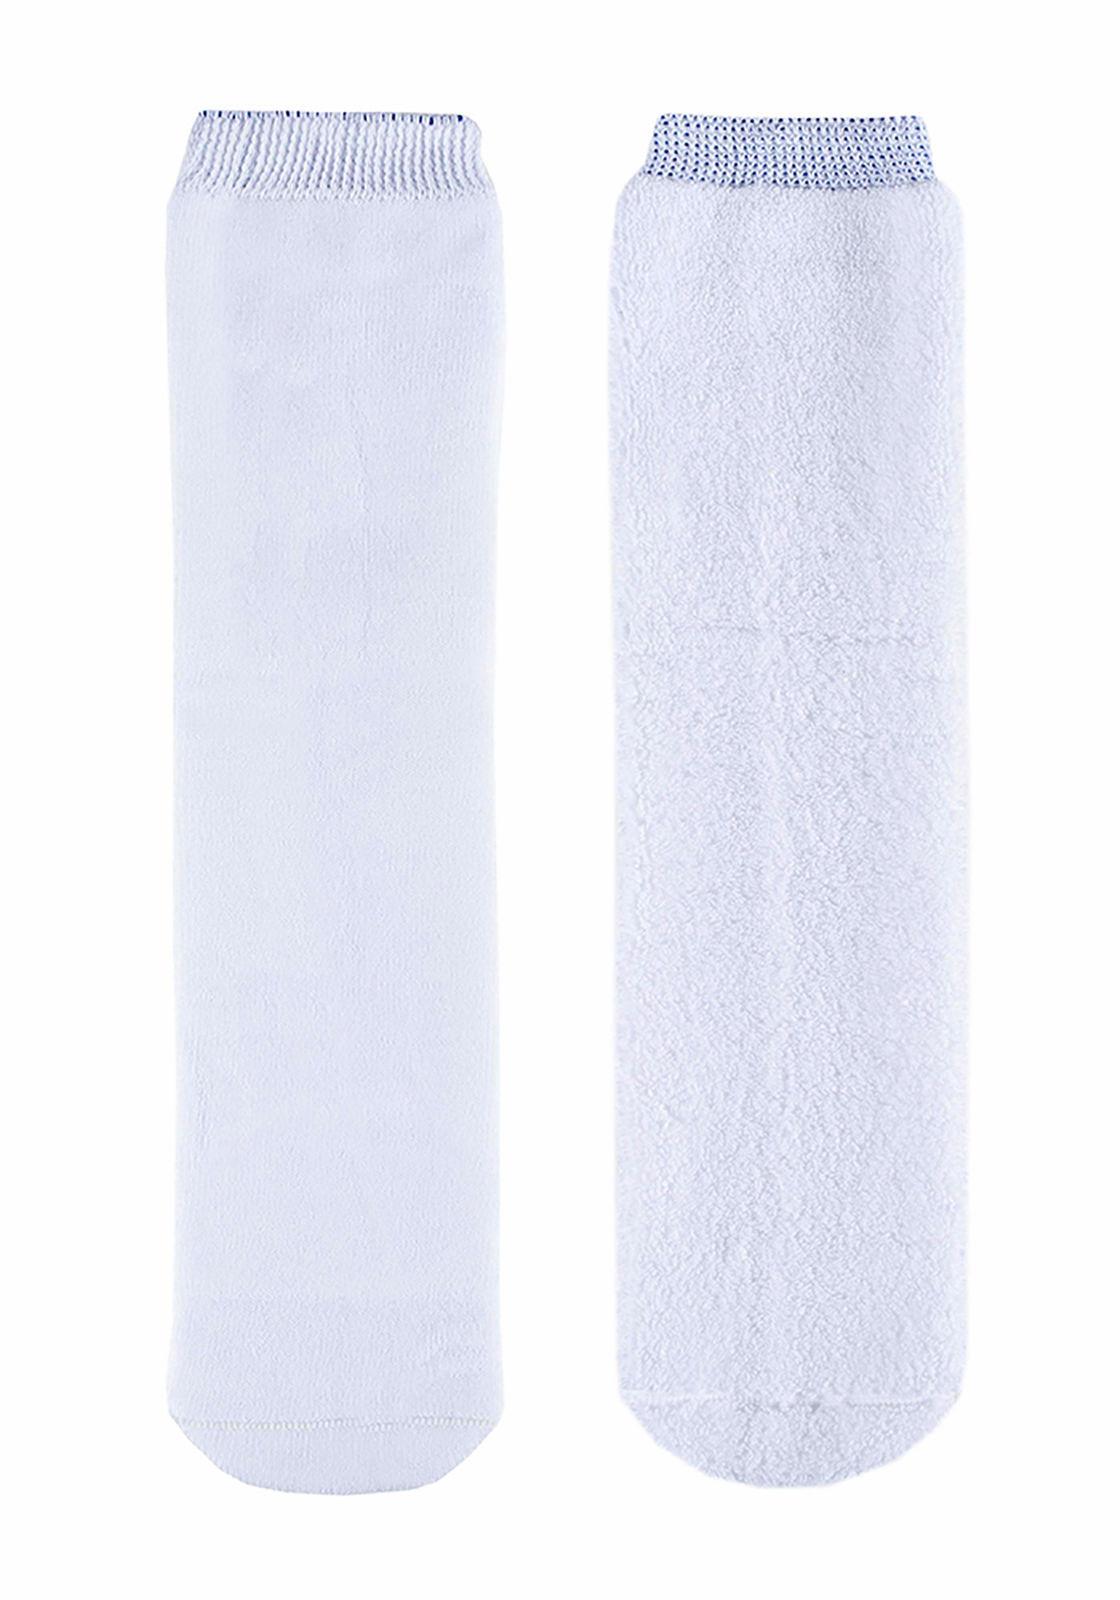 IOMI - 6er prothetischen / prothetik socken für unterhalb des knies amputierten